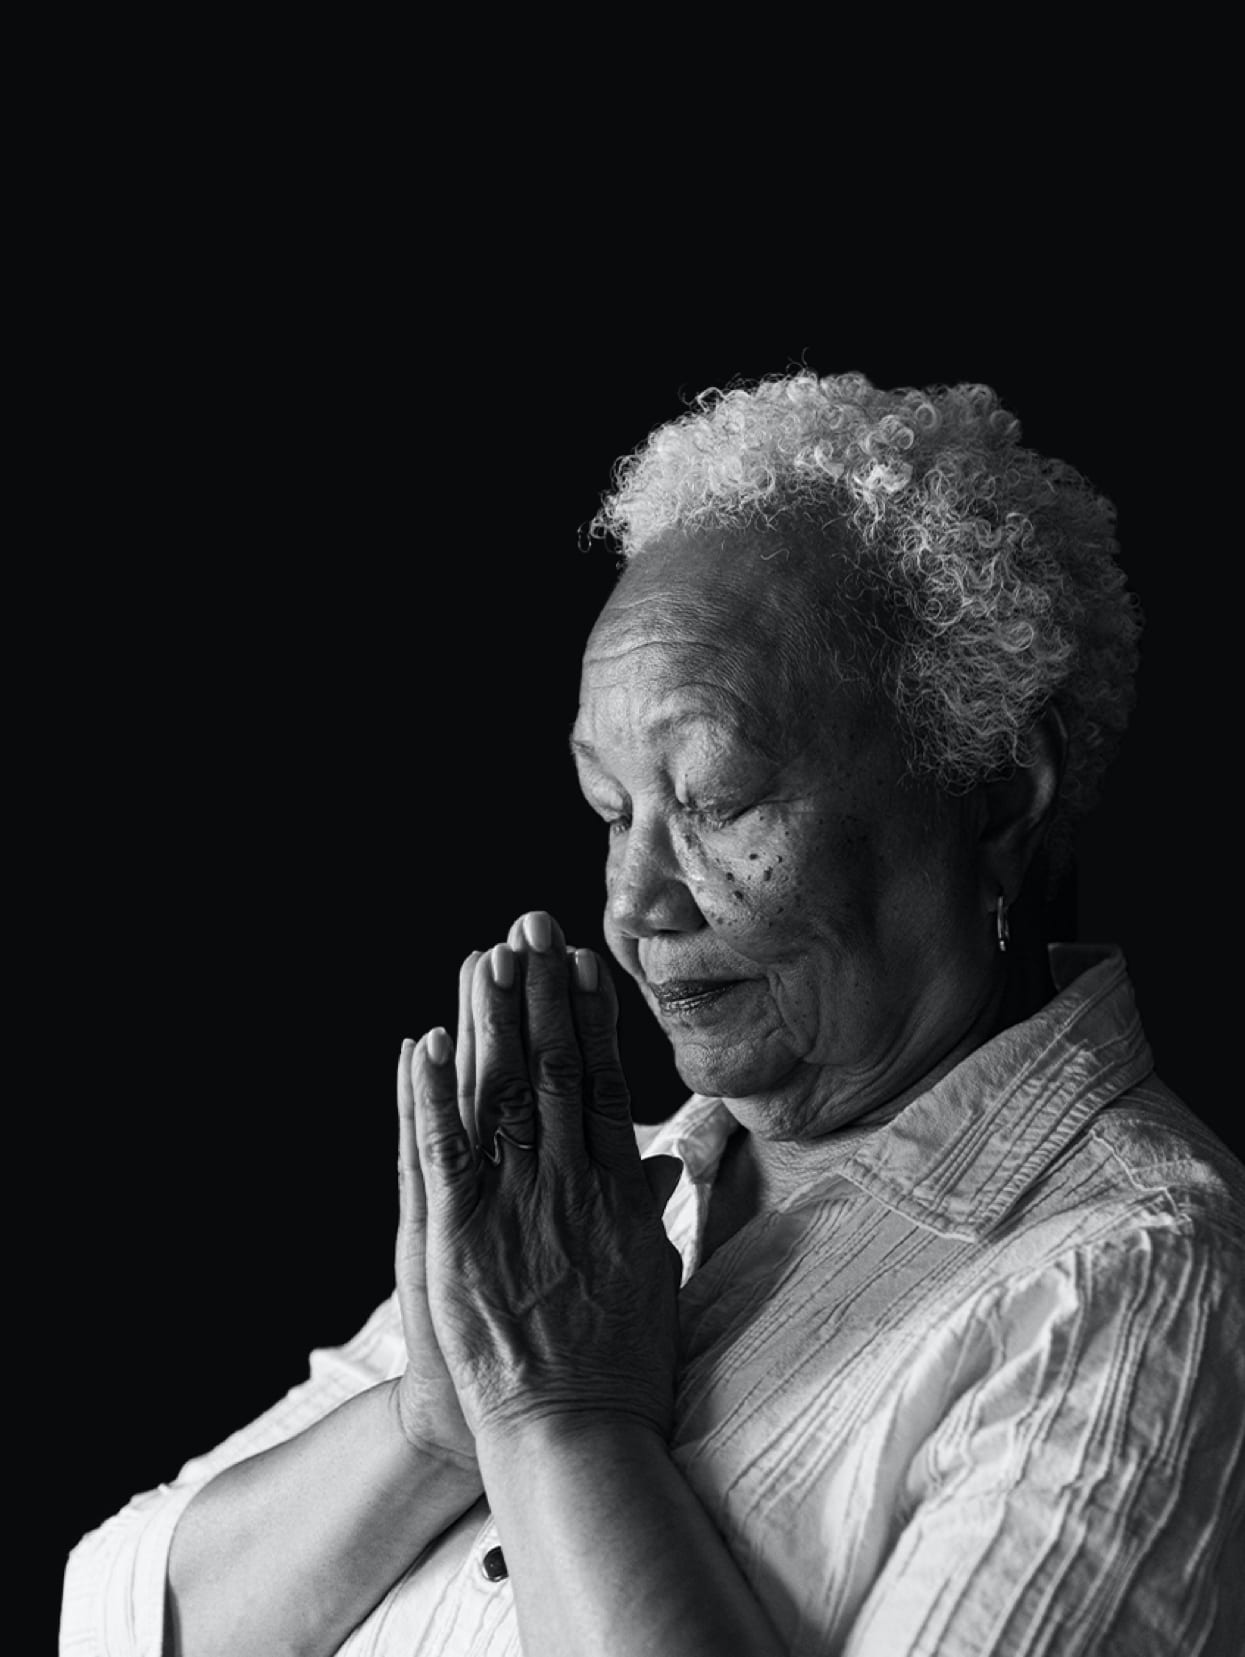 An elderly woman prays